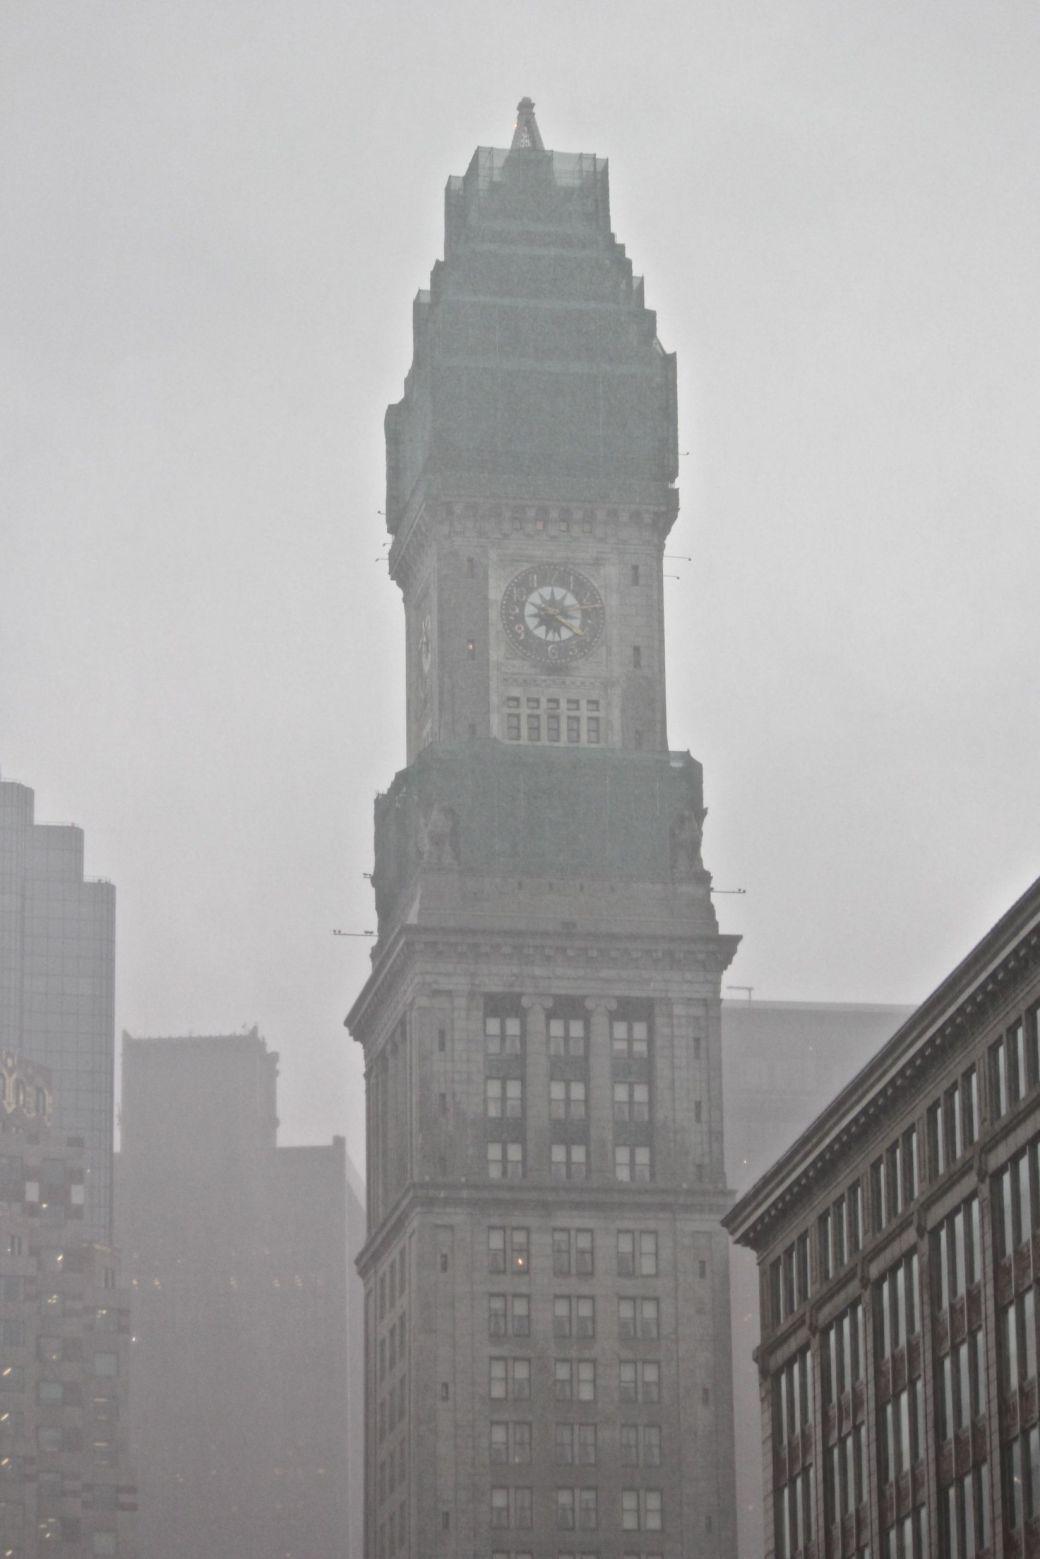 boston rainstorm hail storm august 4 2